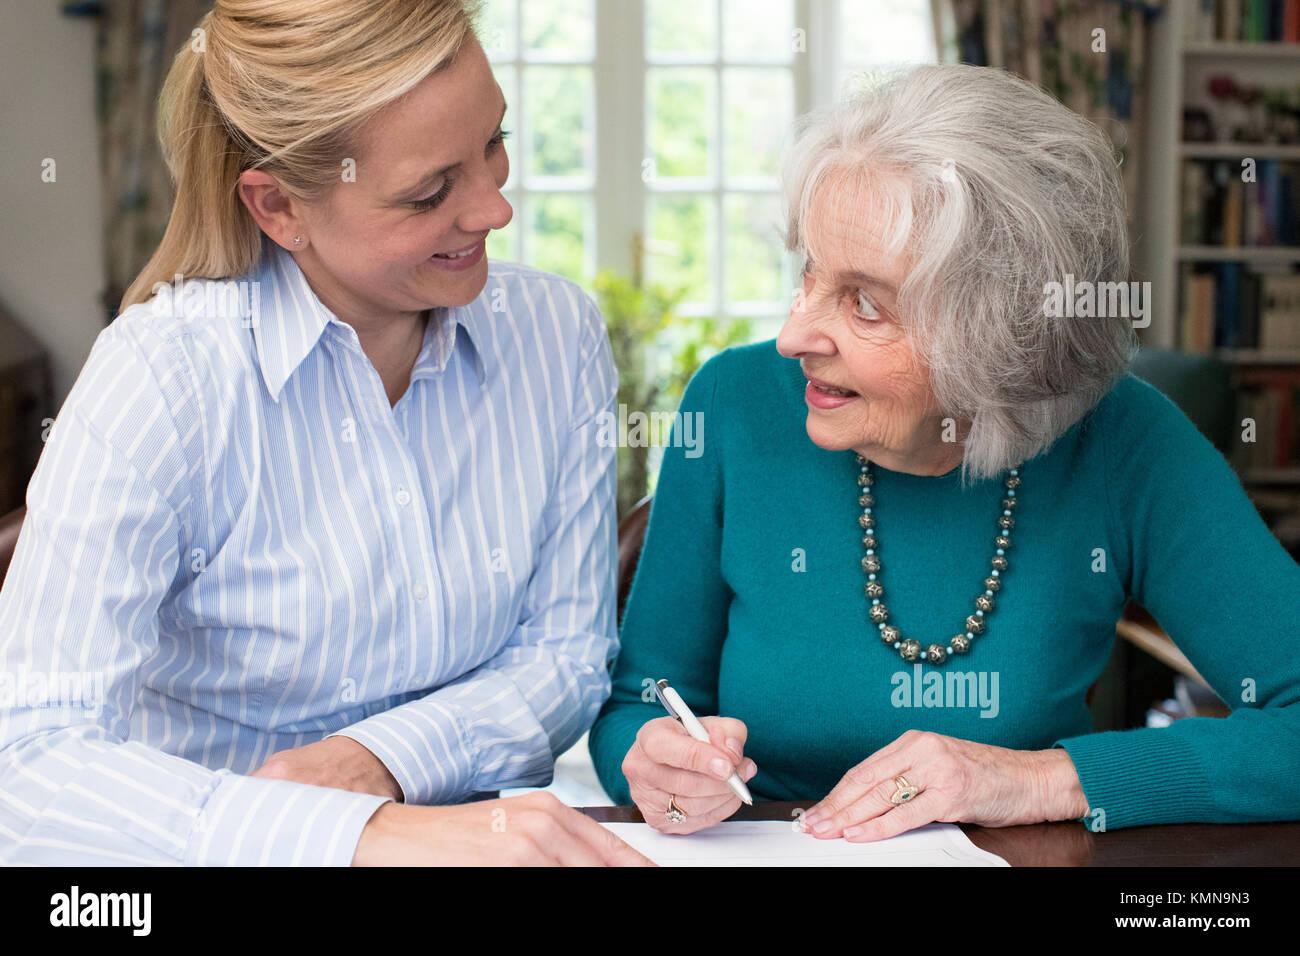 Woman Helping Senior Neighbour With Paperwork - Stock Image